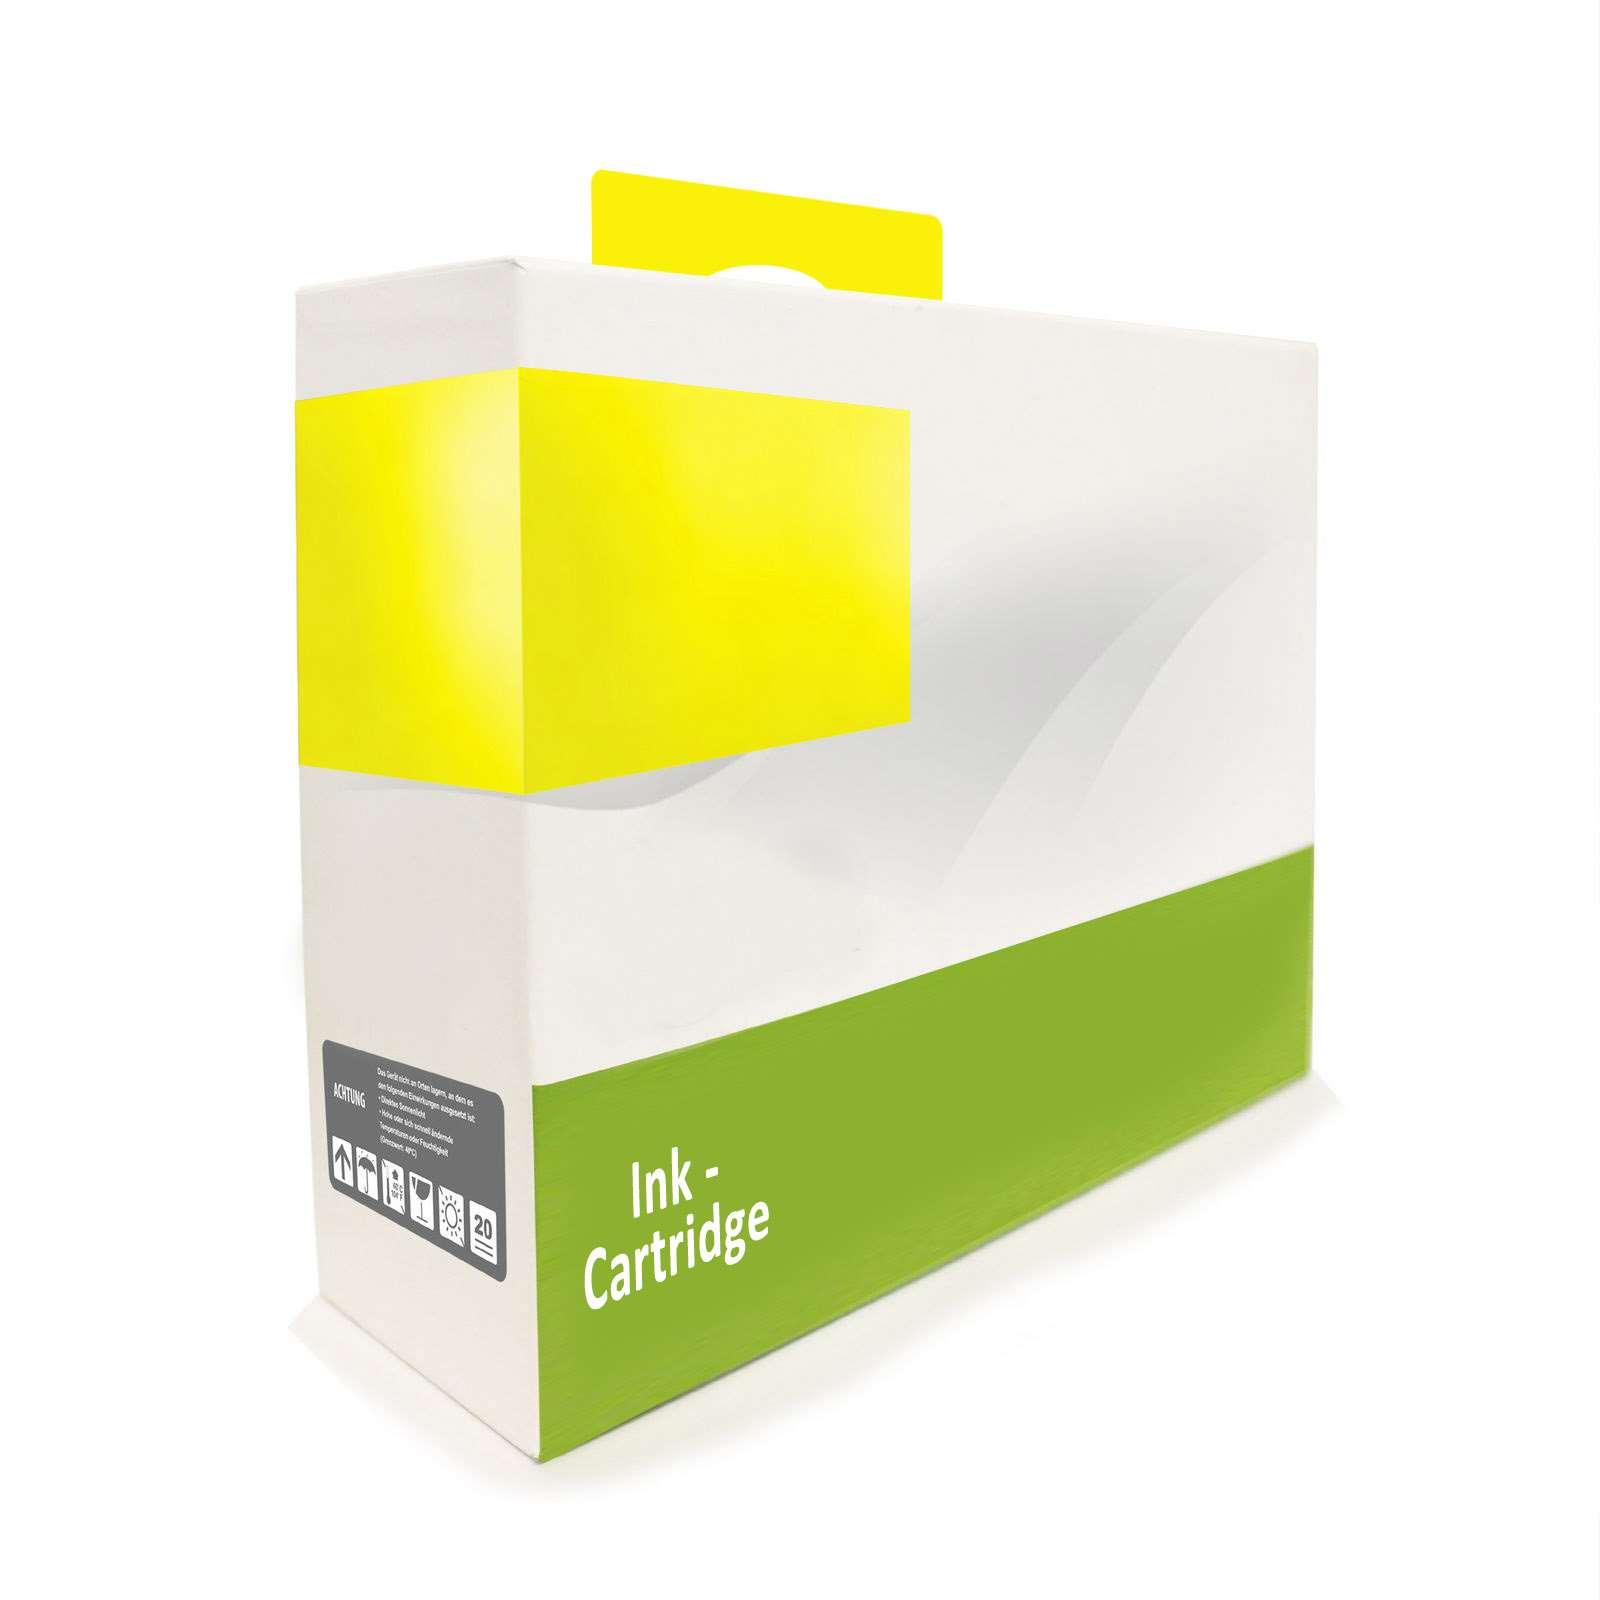 4 Compatible cartridge fits HP 80 INK HP Designjet 1050 1055 1050c 1055cm dfd